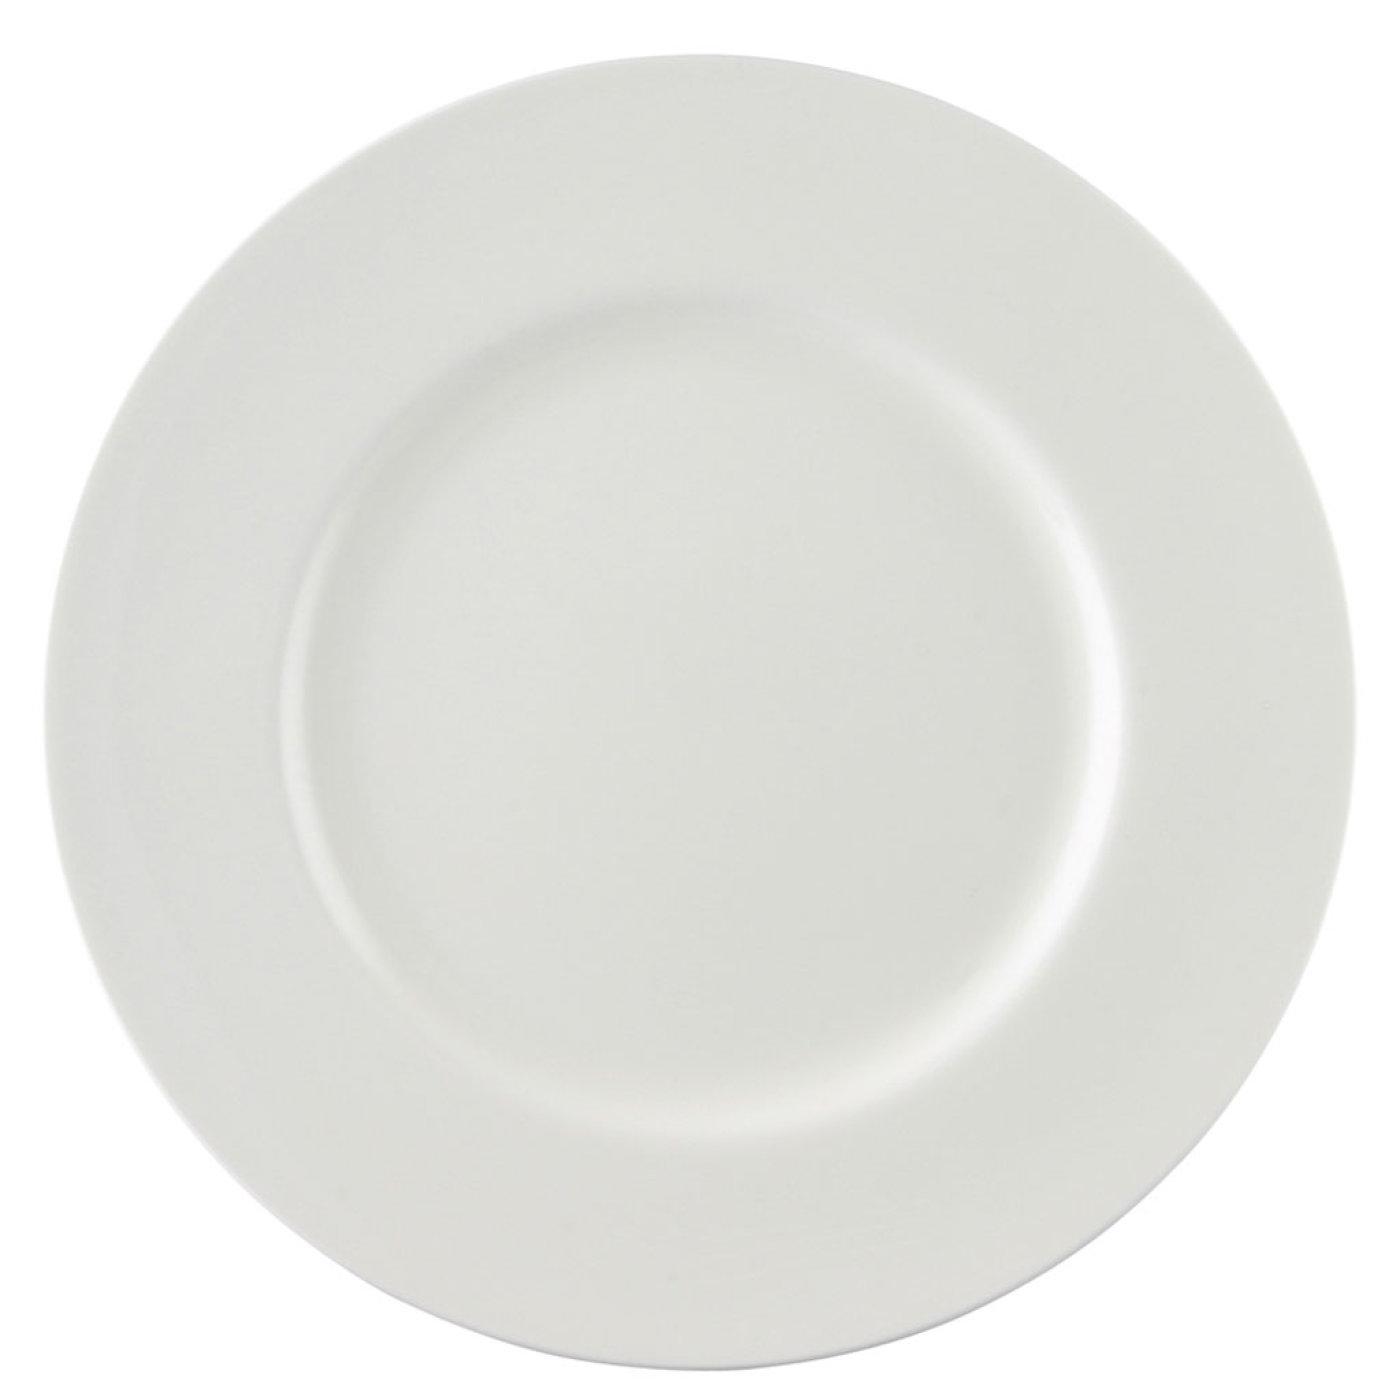 Rotary tray mod. Curve Rosenthal Porcelain